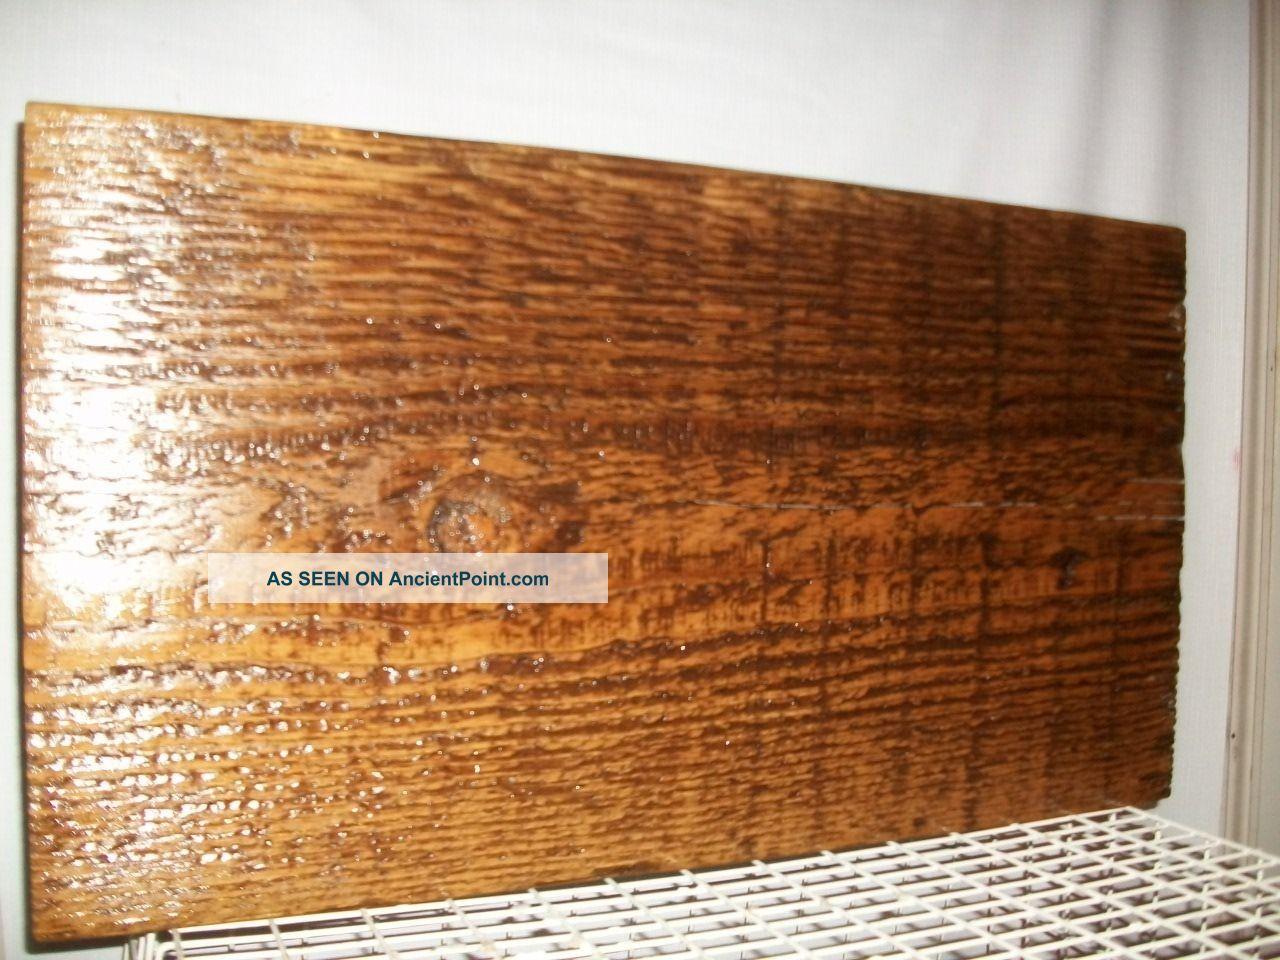 Antique Repurposed Barnwood Table Top Reclaimed Wood Urban Loft Chic ...